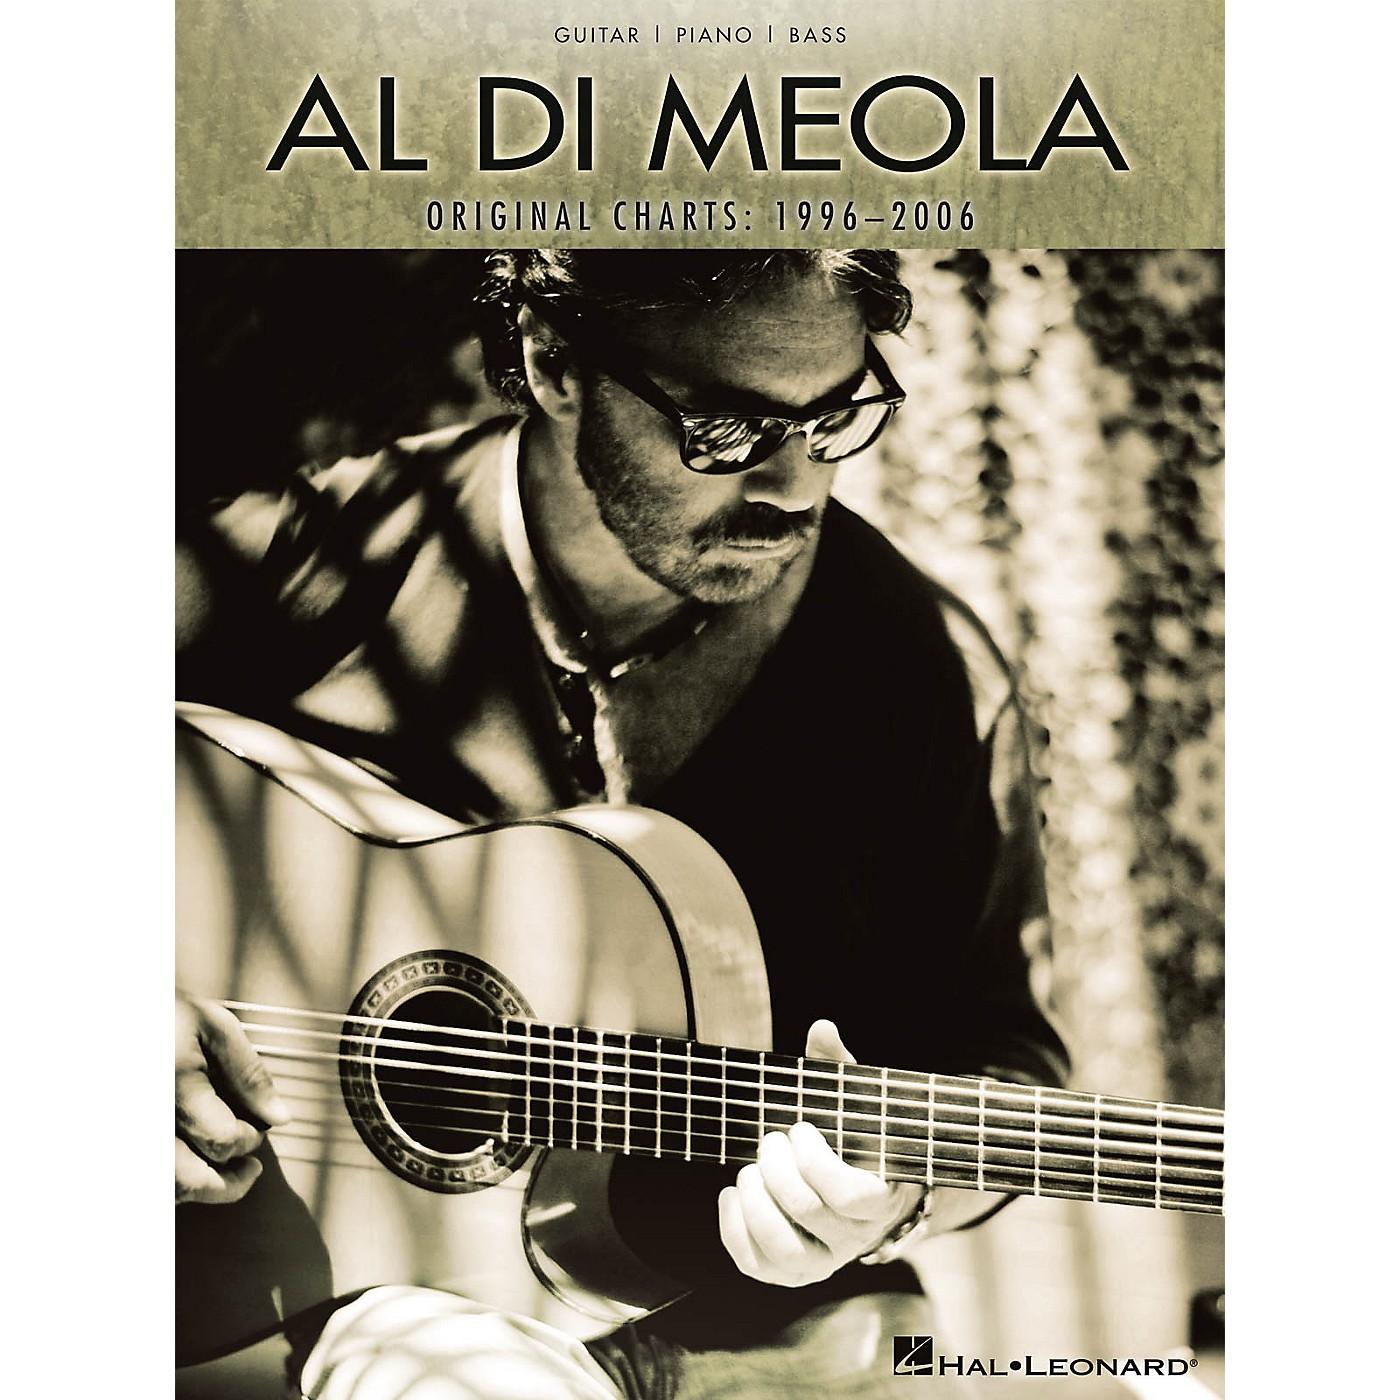 Hal Leonard Al Di Meola - Original Charts: 1996-2006 (Guitar/Piano/Bass) Artist Books Series Softcover by Al Di Meola thumbnail